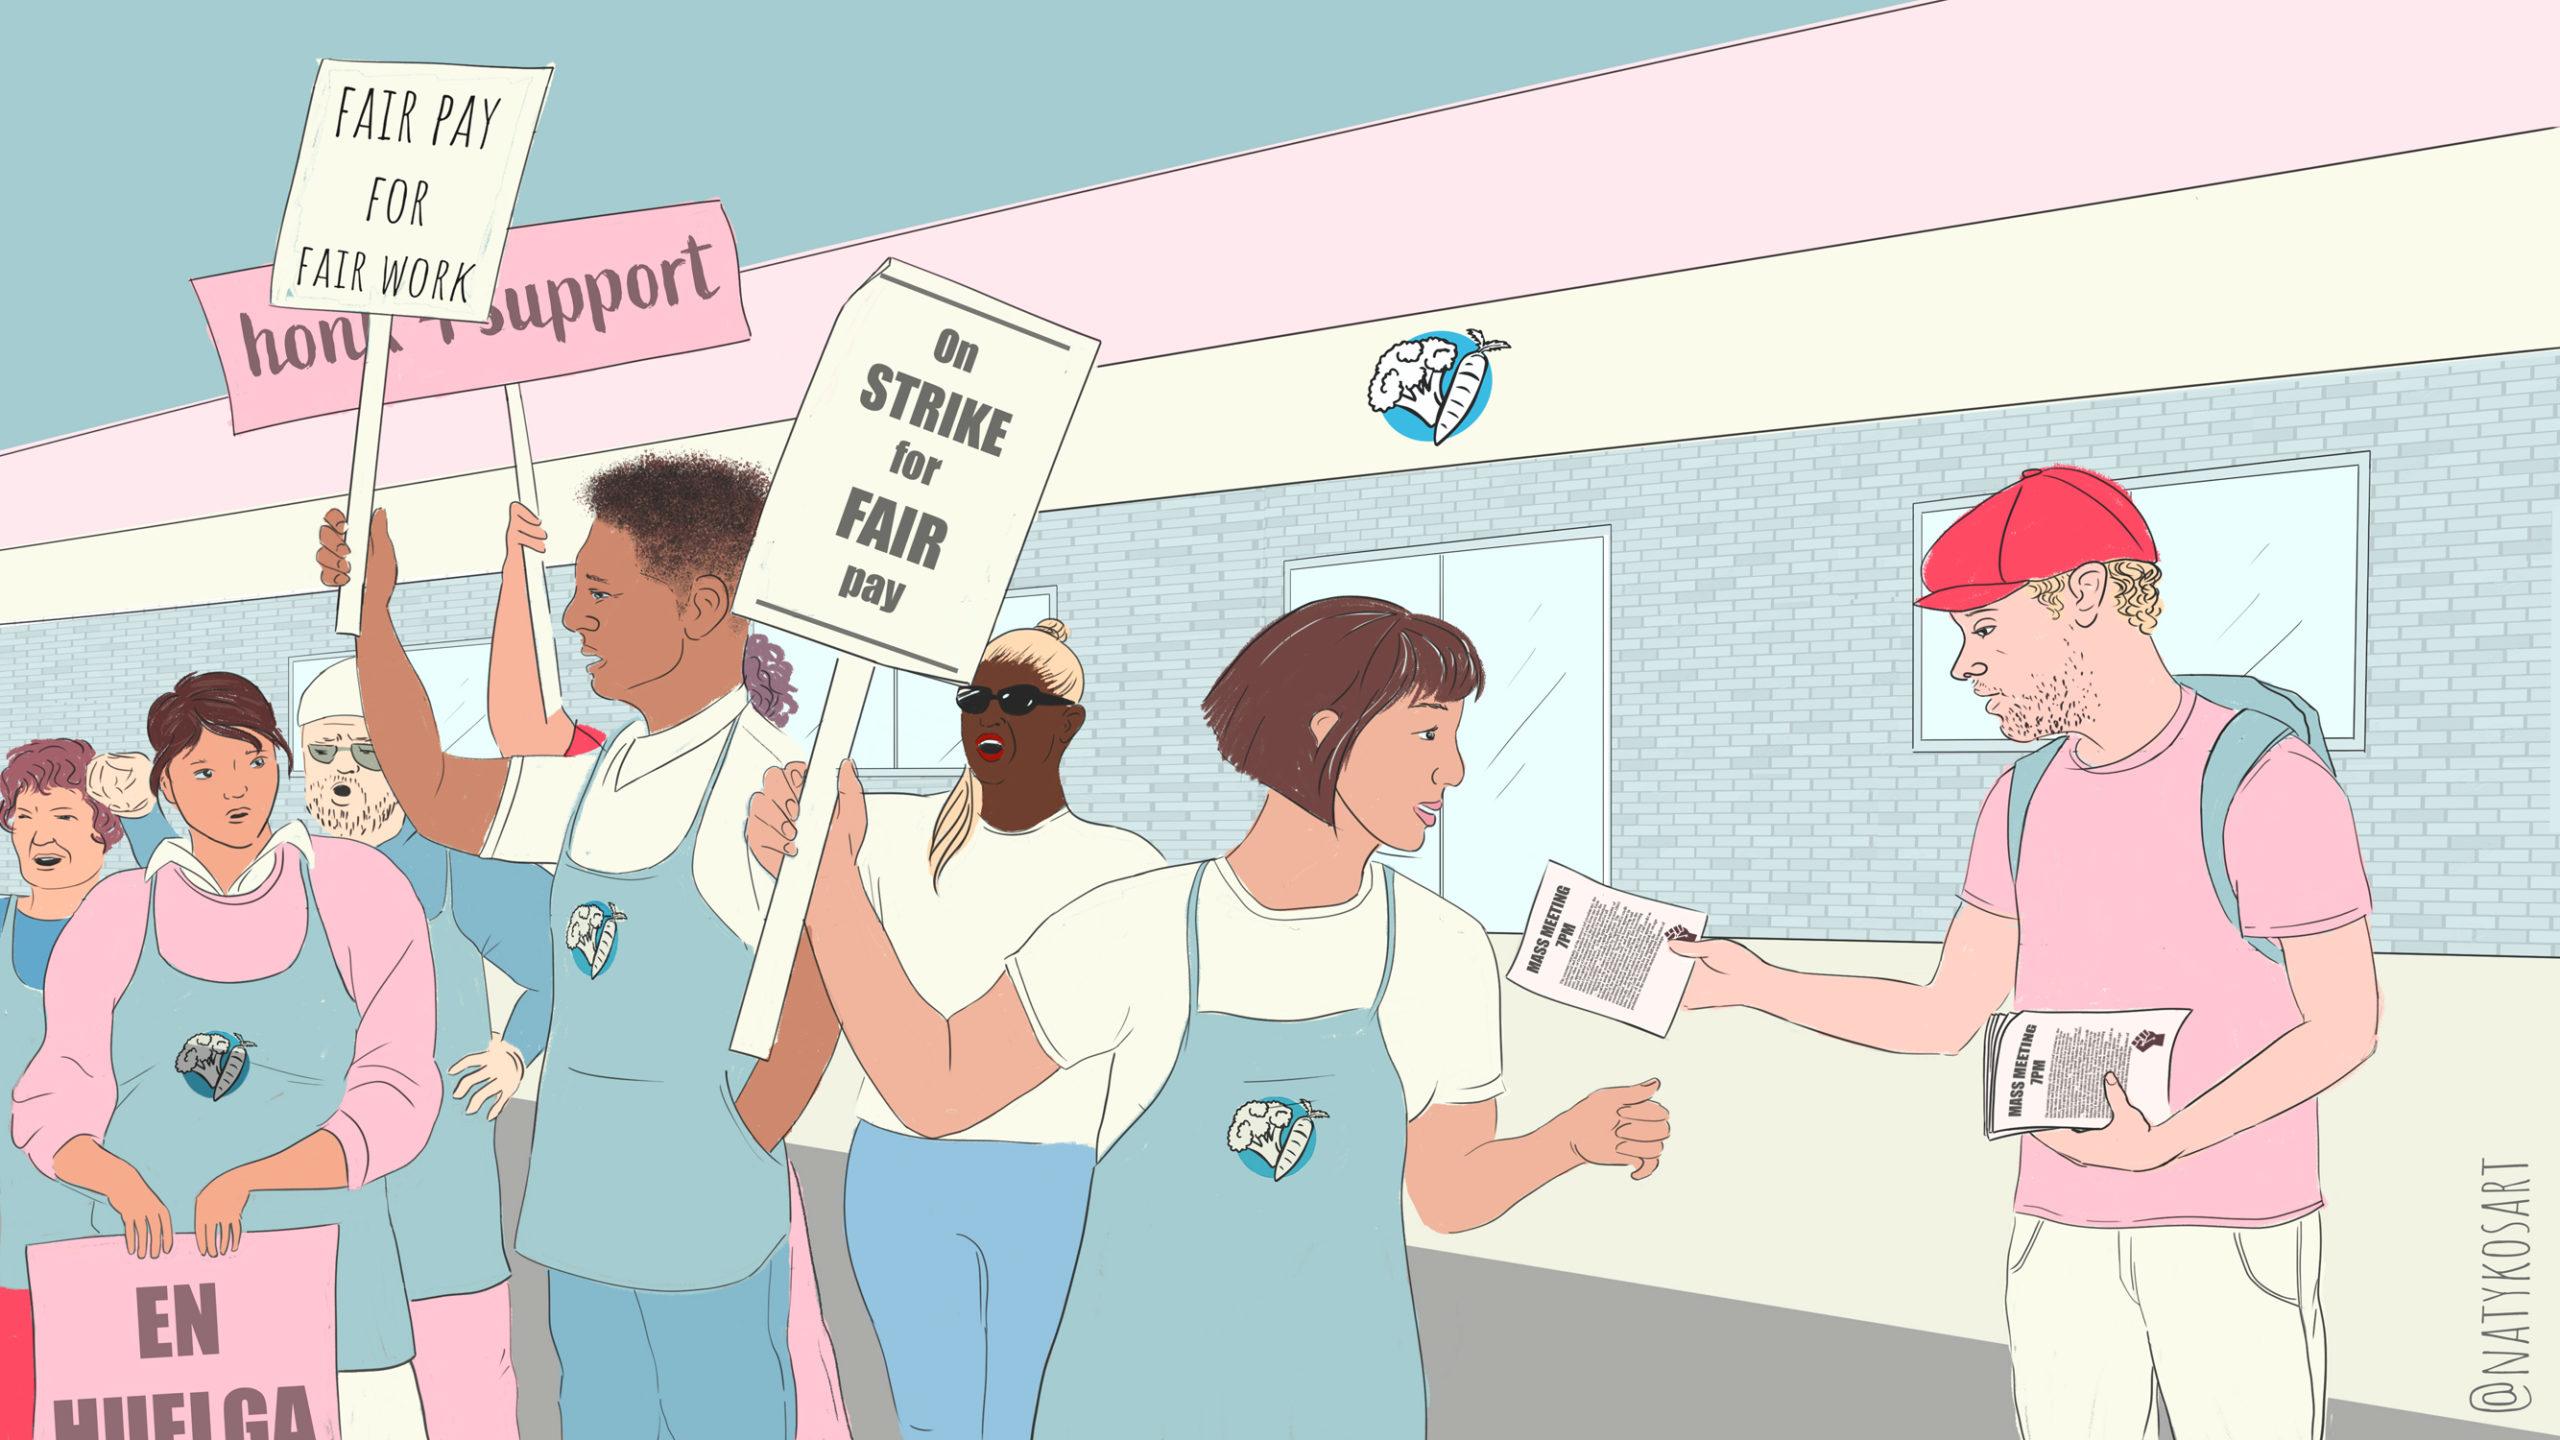 Workplace struggles are political